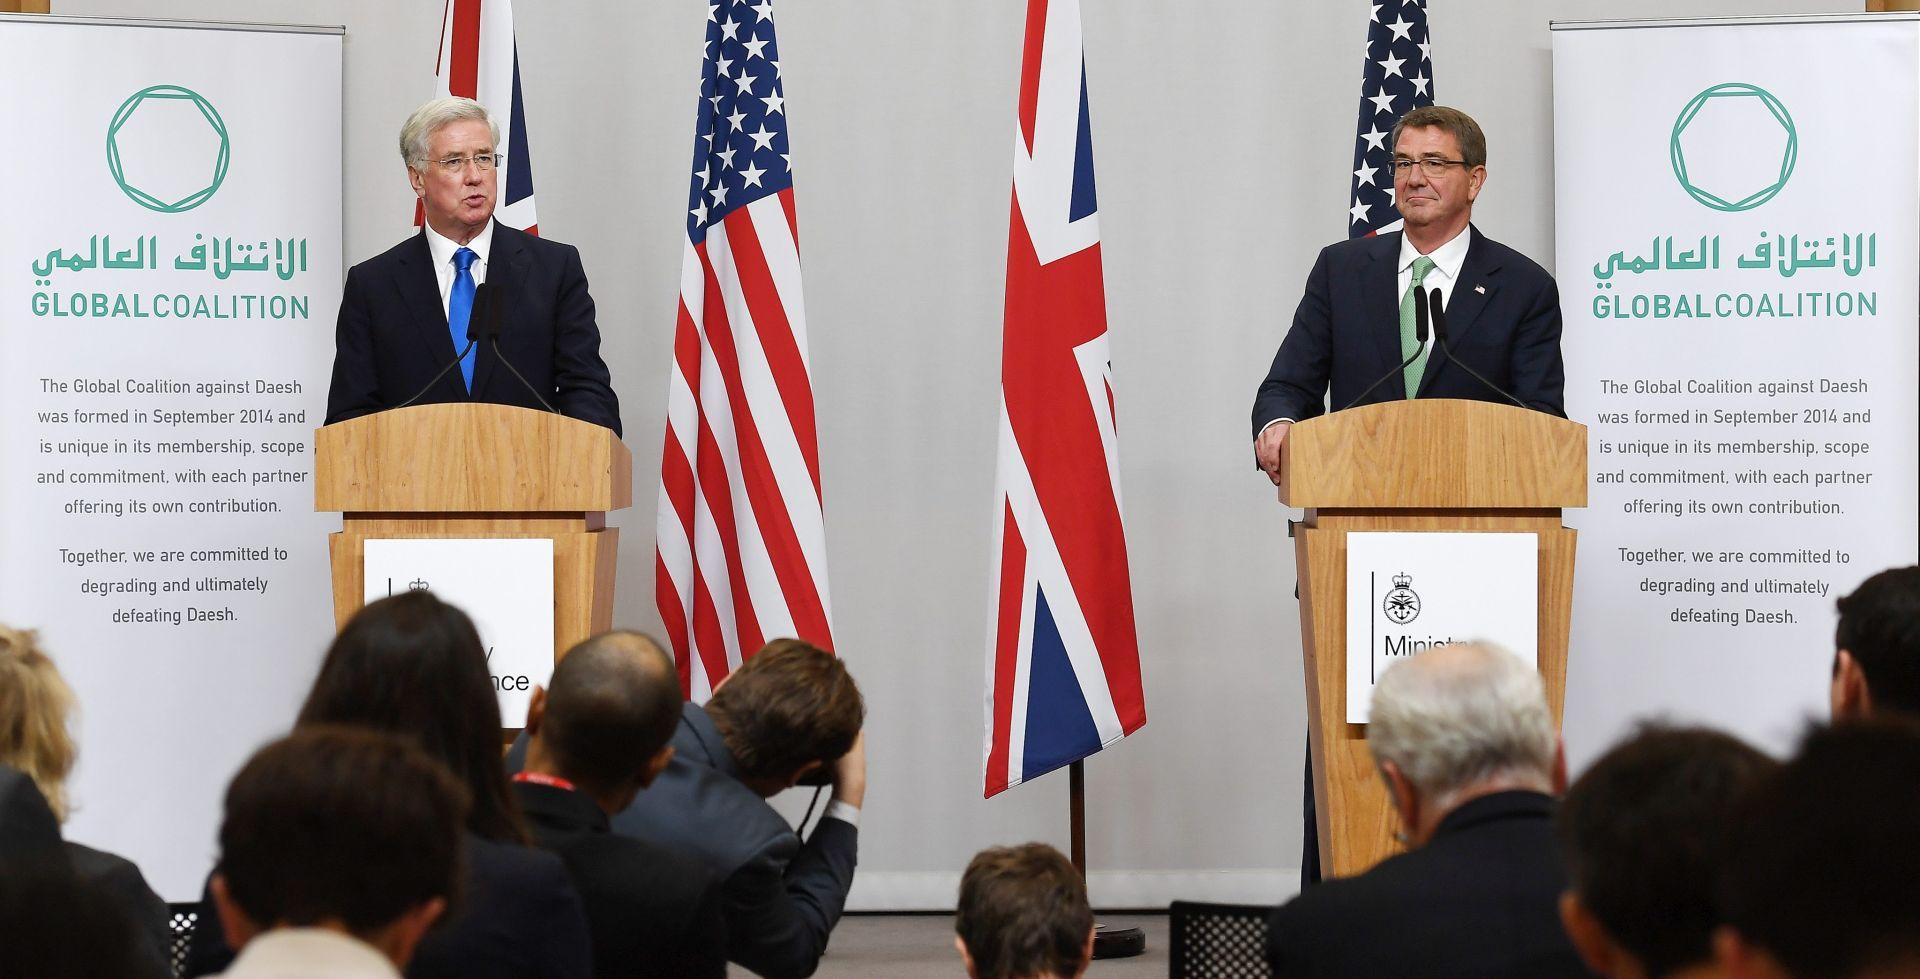 WASHINGTON Okuplja se koalicija za borbu protiv IS-a